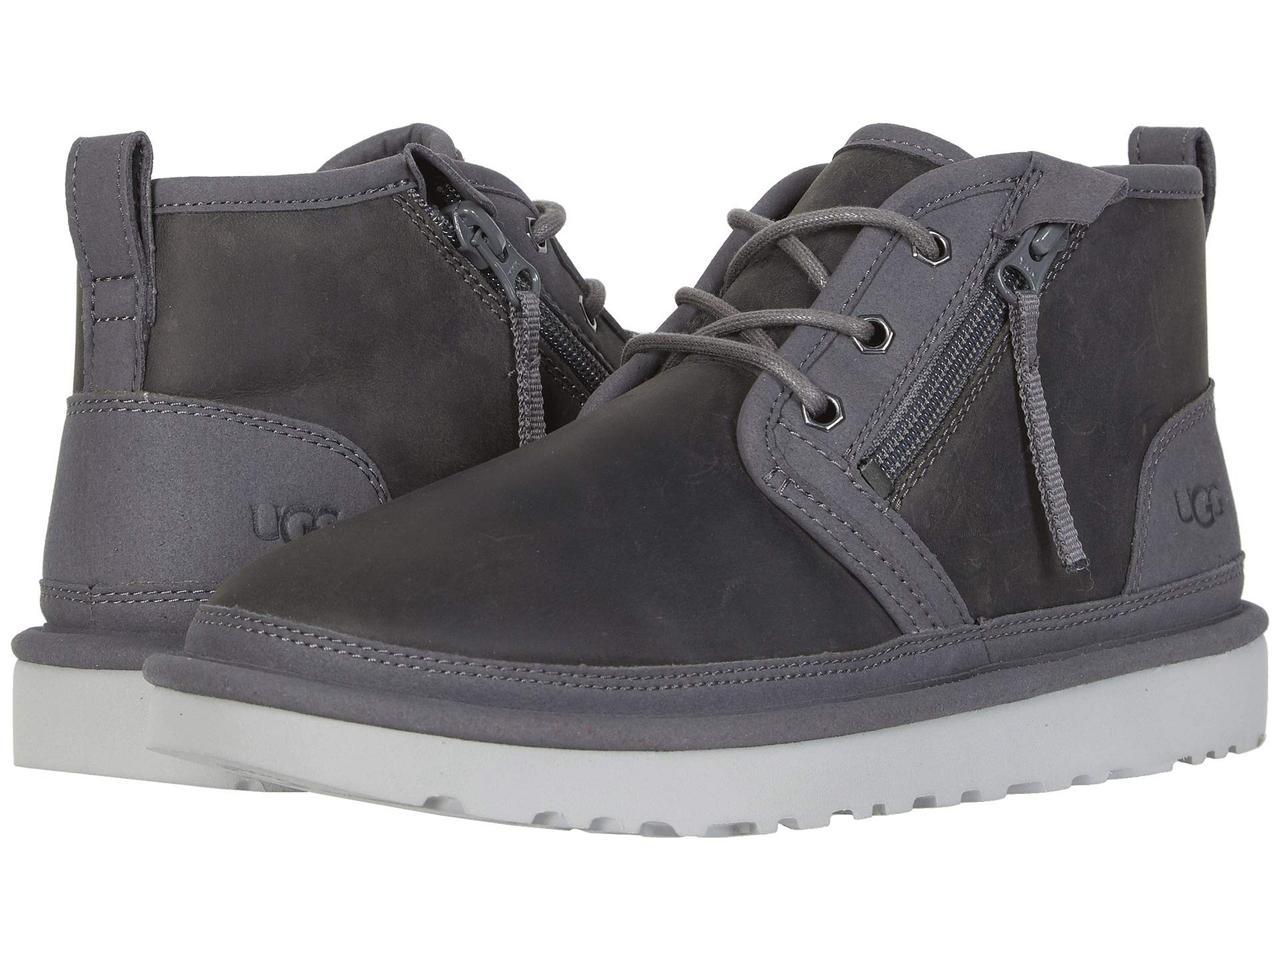 Ботинки/Сапоги (Оригинал) UGG Neumel Zip Dark Grey